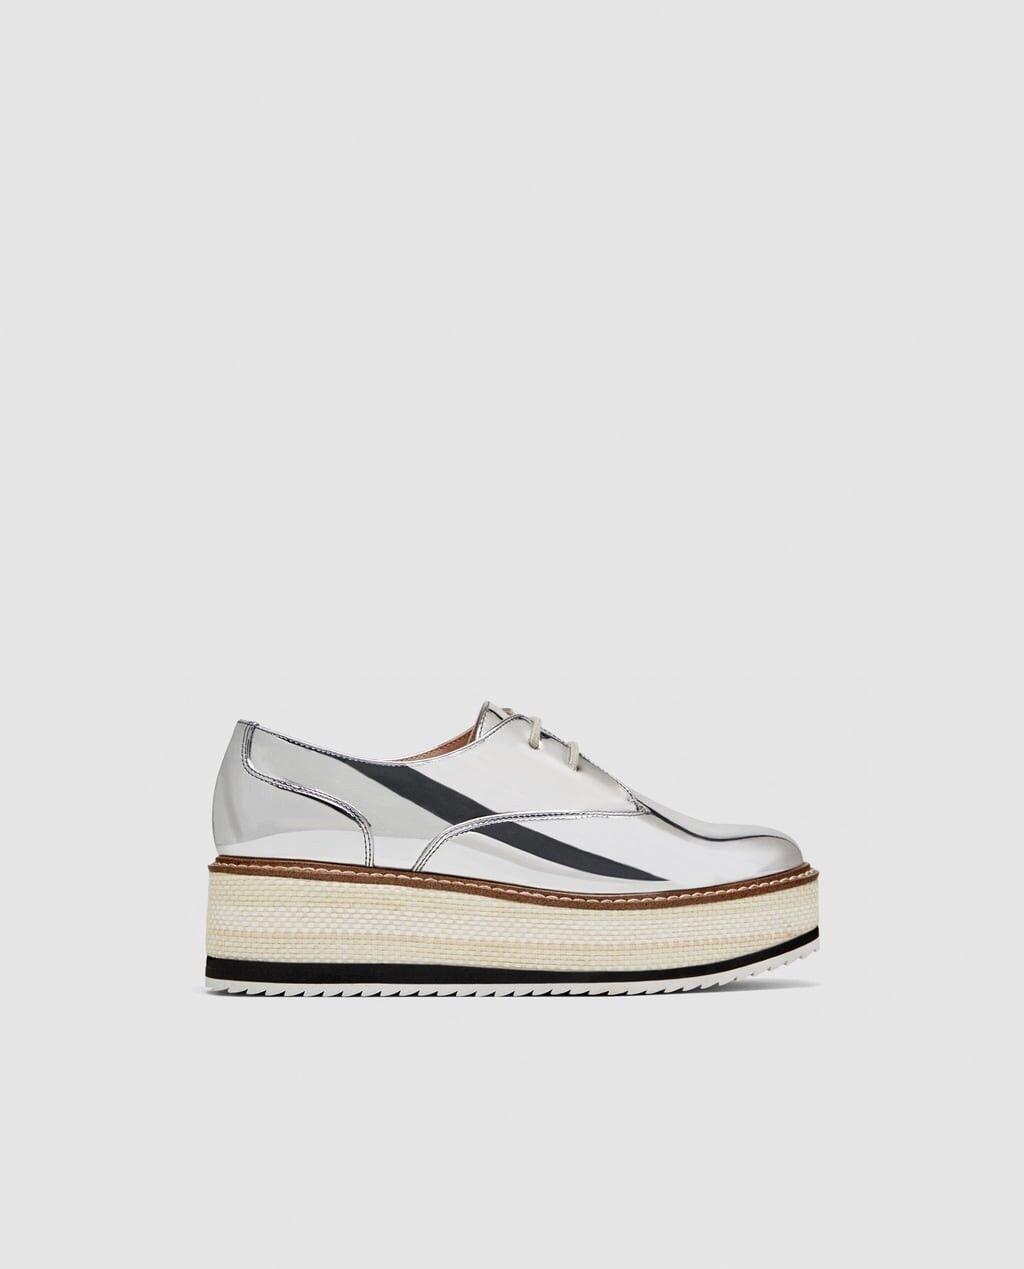 Zara Damens Silver Flatform Derby Schuhes Größe NWT 7.5 EU 38 NWT Größe 97f557